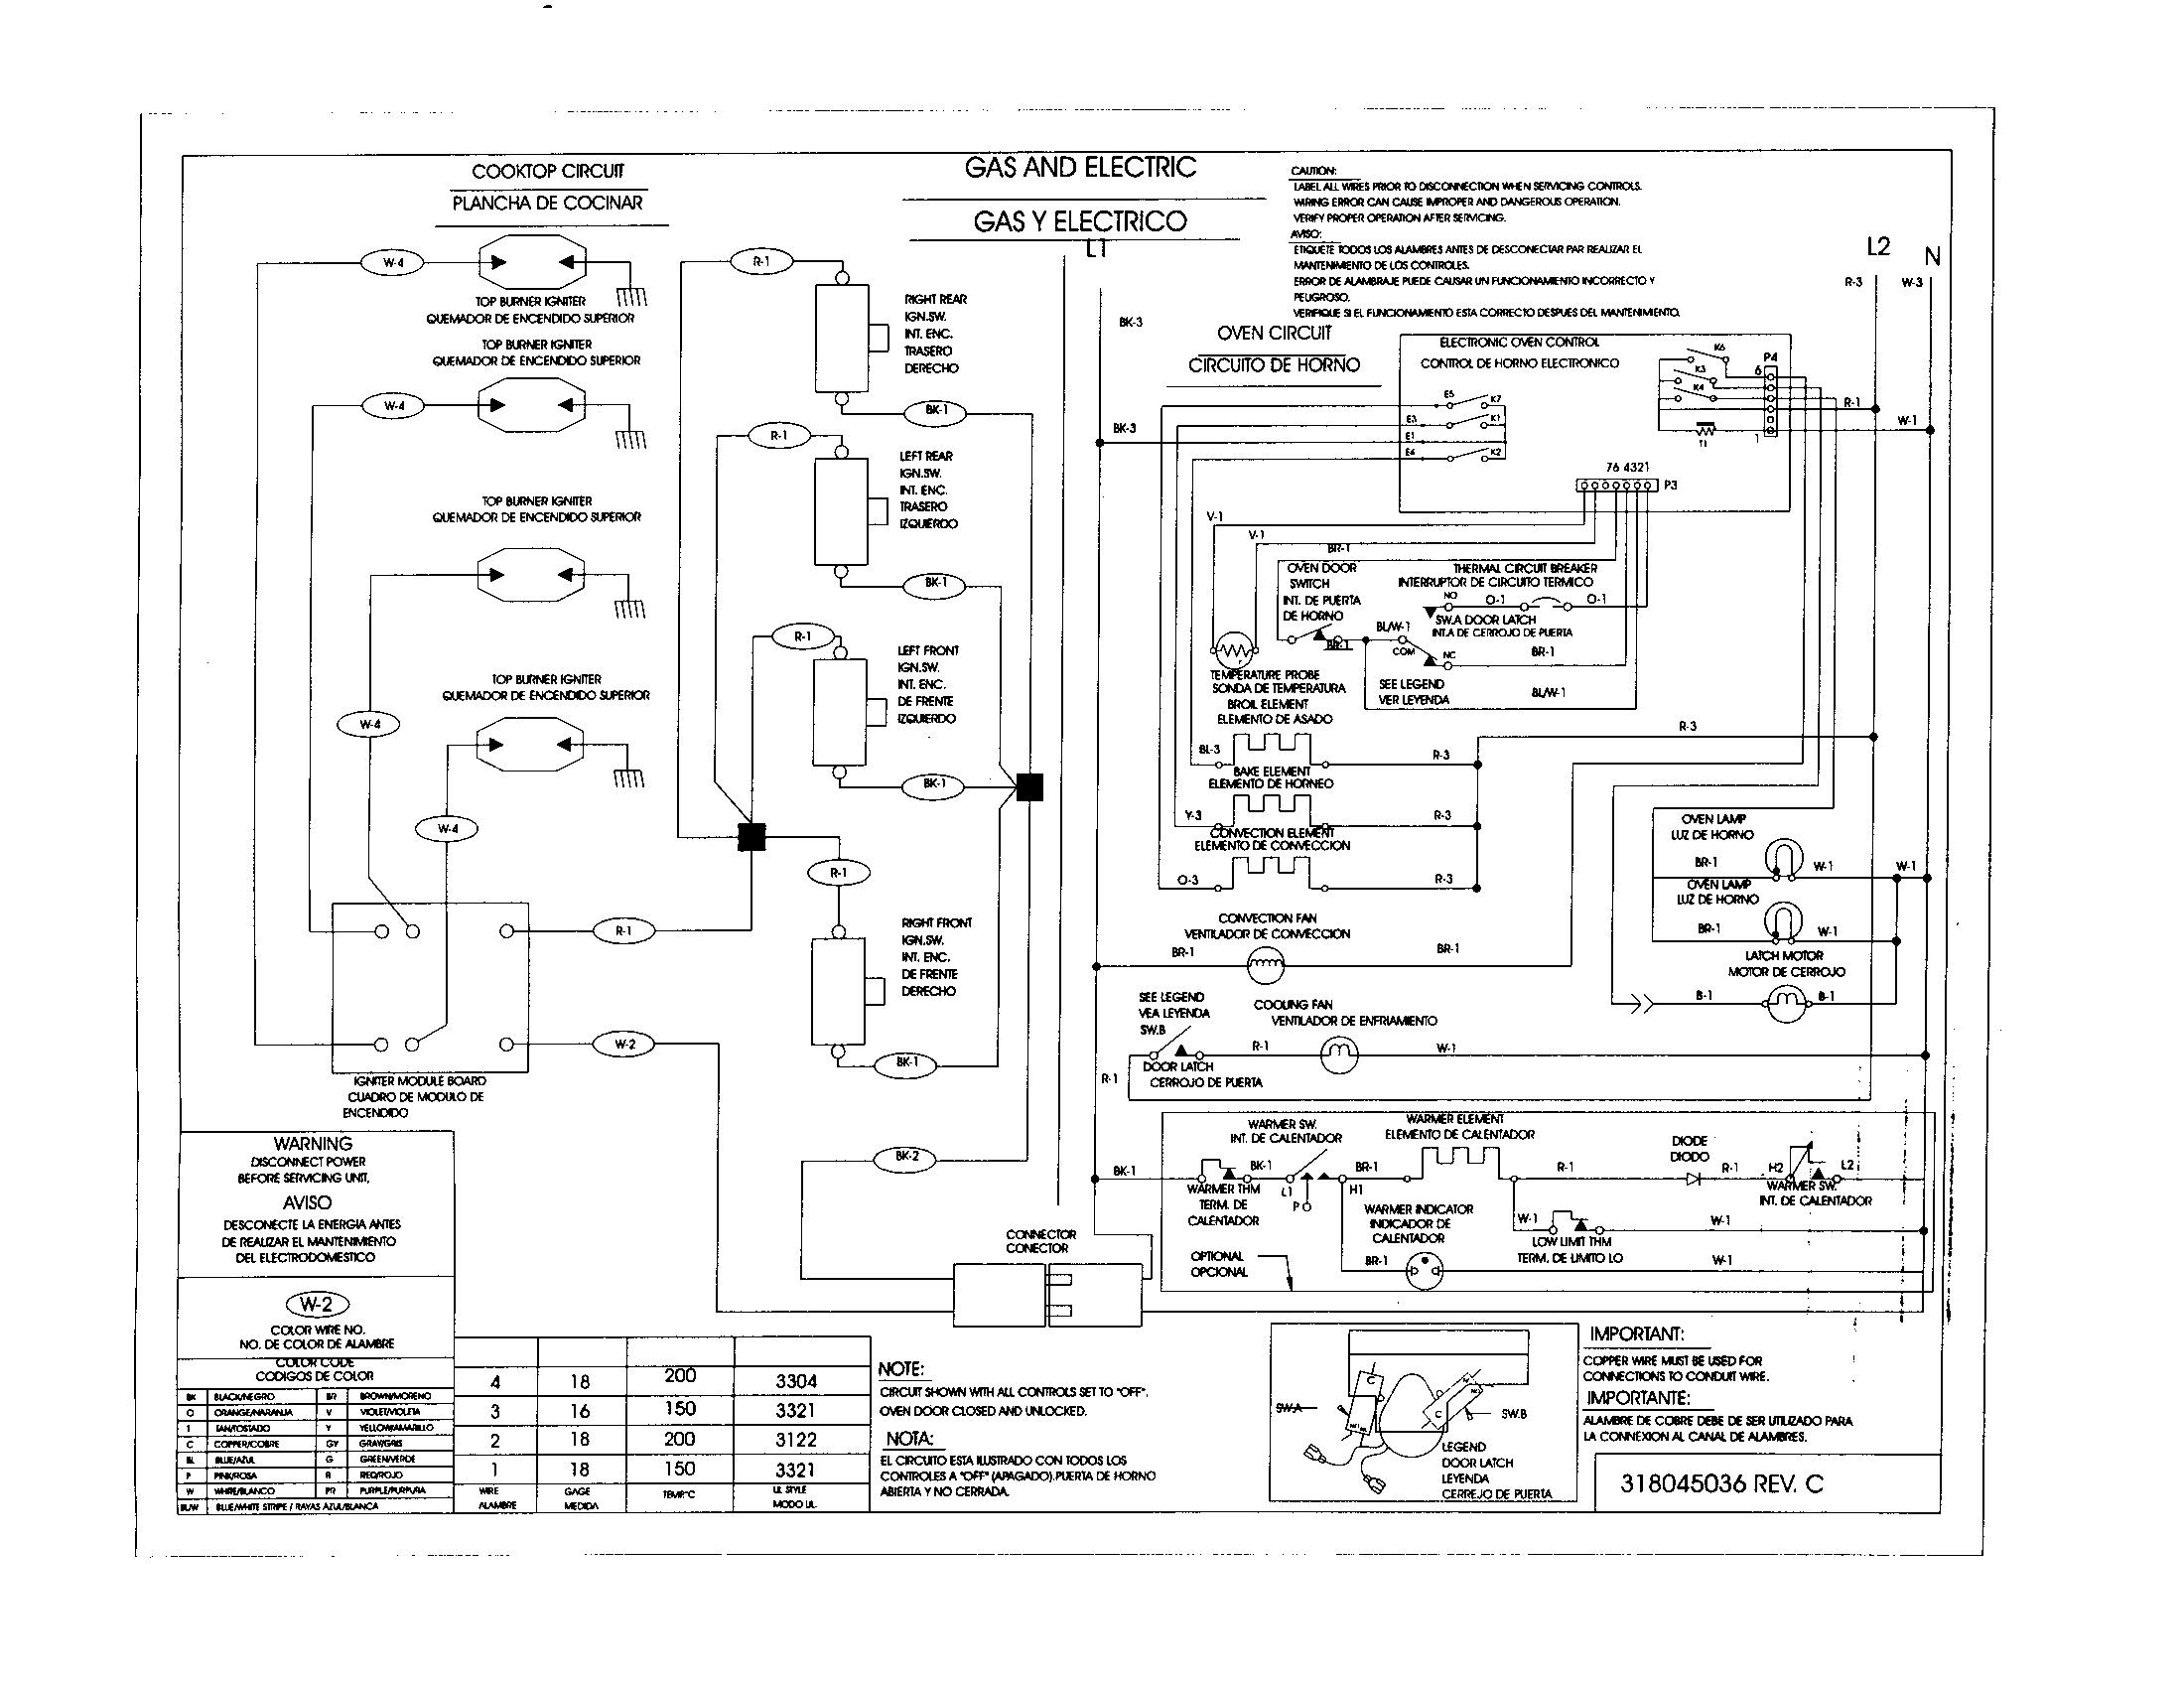 Terrific Bpc 1 Dual Fuel Control Wiring Diagram Wiring Diagram Wiring Cloud Hemtegremohammedshrineorg